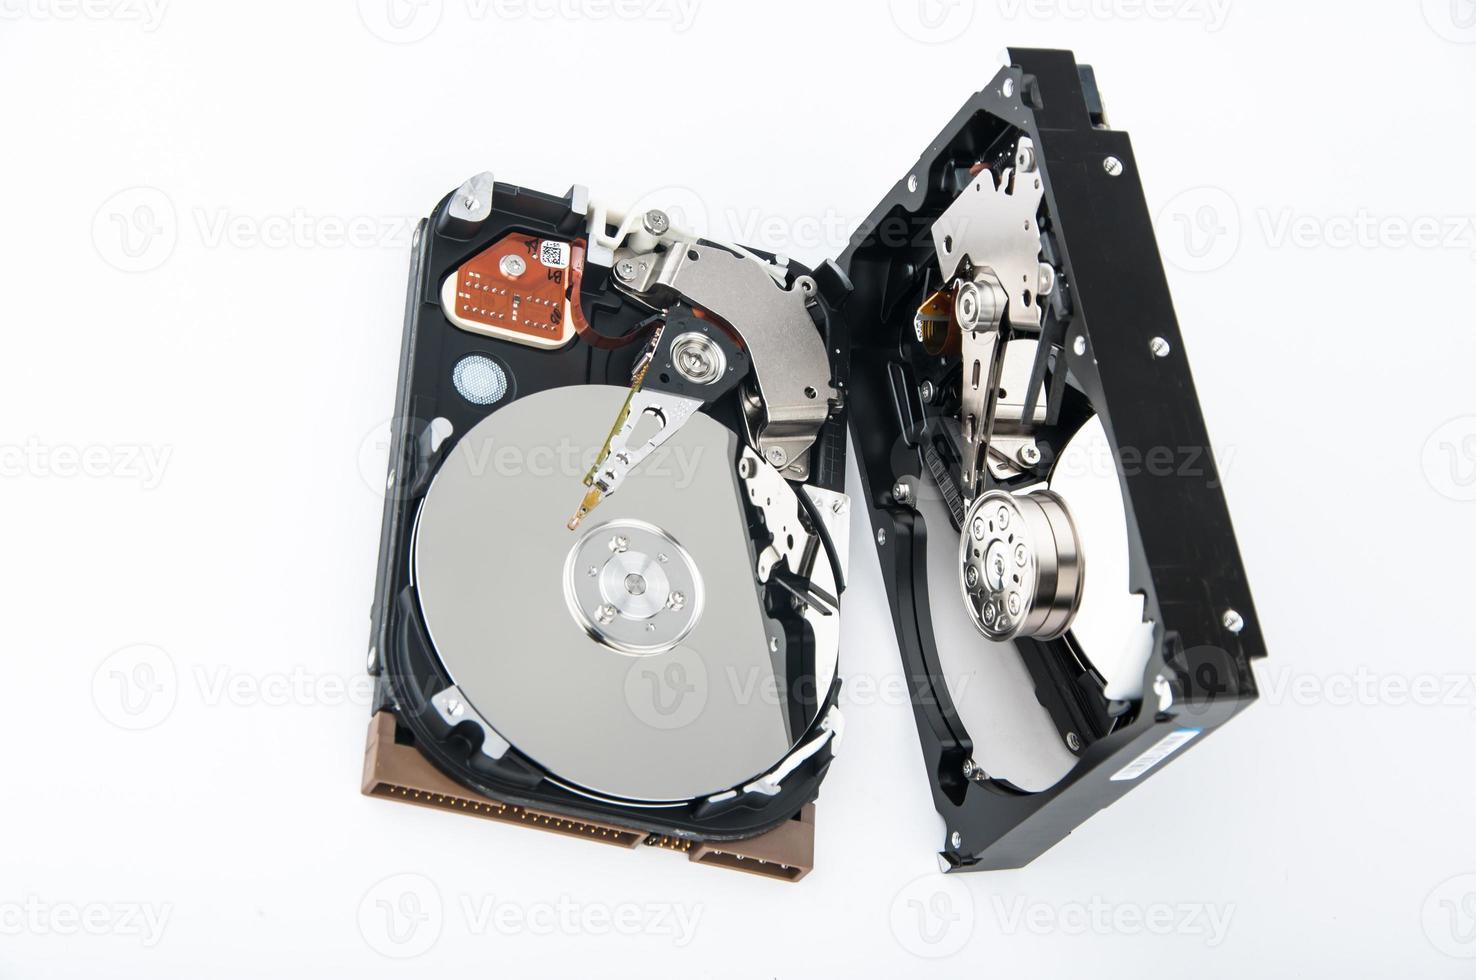 primer plano de dos unidades de disco duro foto